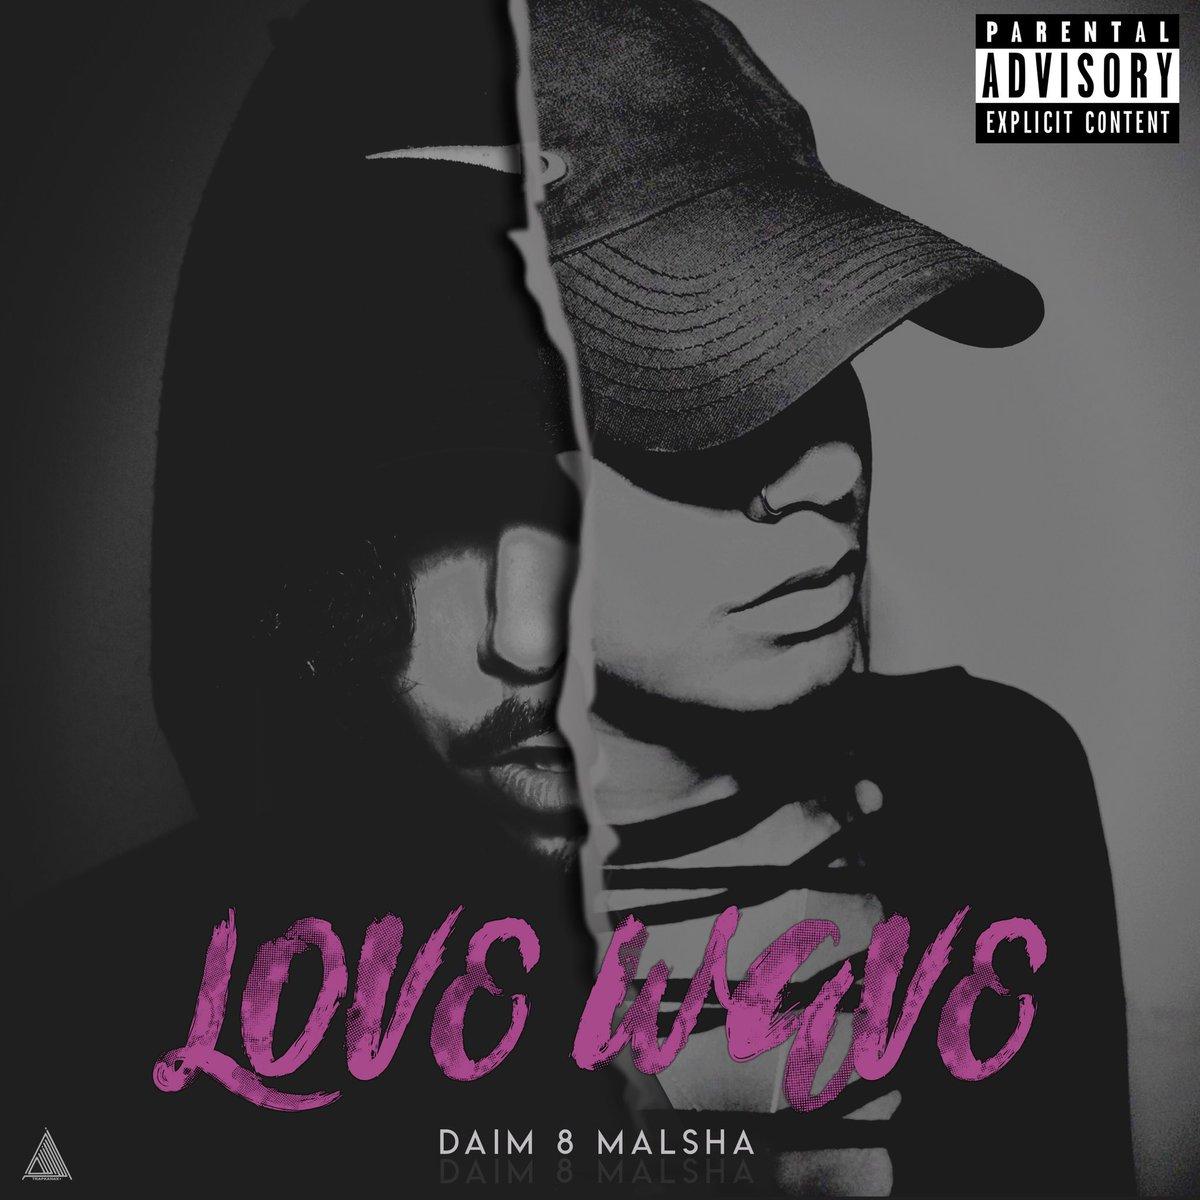 Neues #Trap Tape LOVE WAVE von @daim_crime& @Malshaaa jetzt anhören: https://soundcloud.com/crime-daim/sets/love-wave…   #deutschtrap #deutschrap #deutschhiphop #femalemc #trapmusic #trapmusik #hamburgtrap #hamburghiphop #nürnberg #hiphop #musicproduction #singerpic.twitter.com/ImdtBEdPte